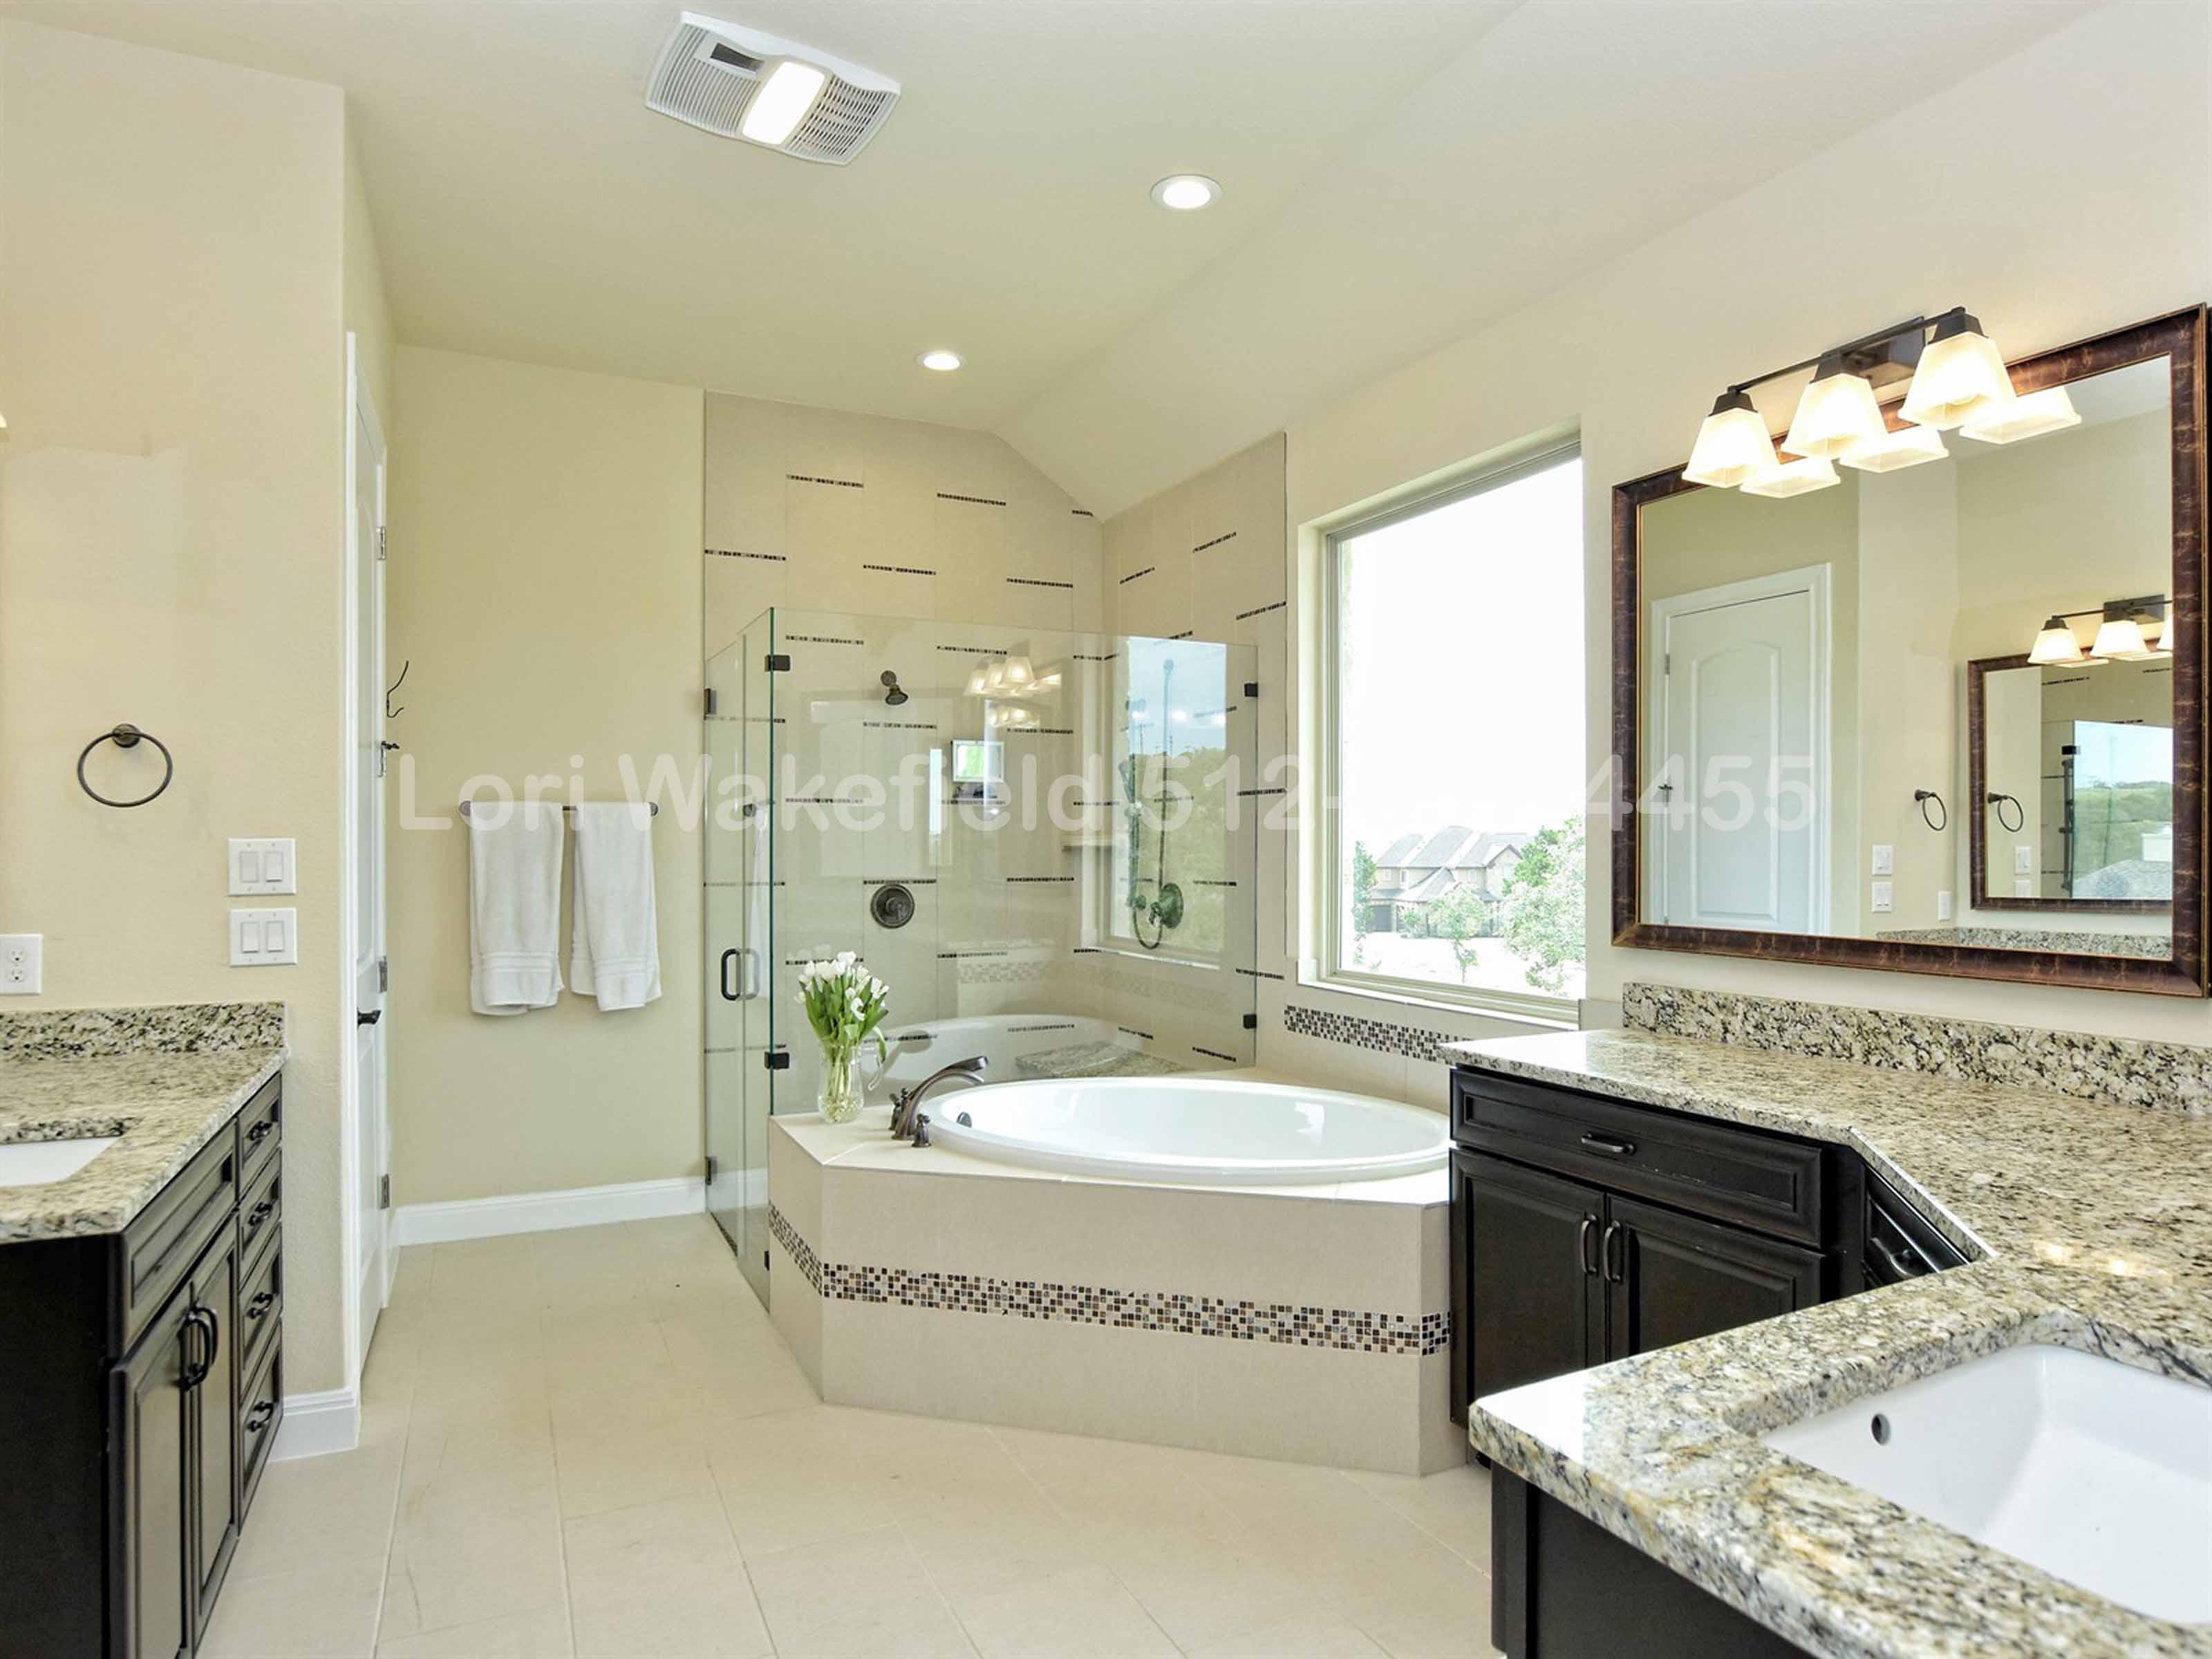 5421 Diamante Spicewood TX | Lake Travis Real Estate | AustinRealEstateGroup.com